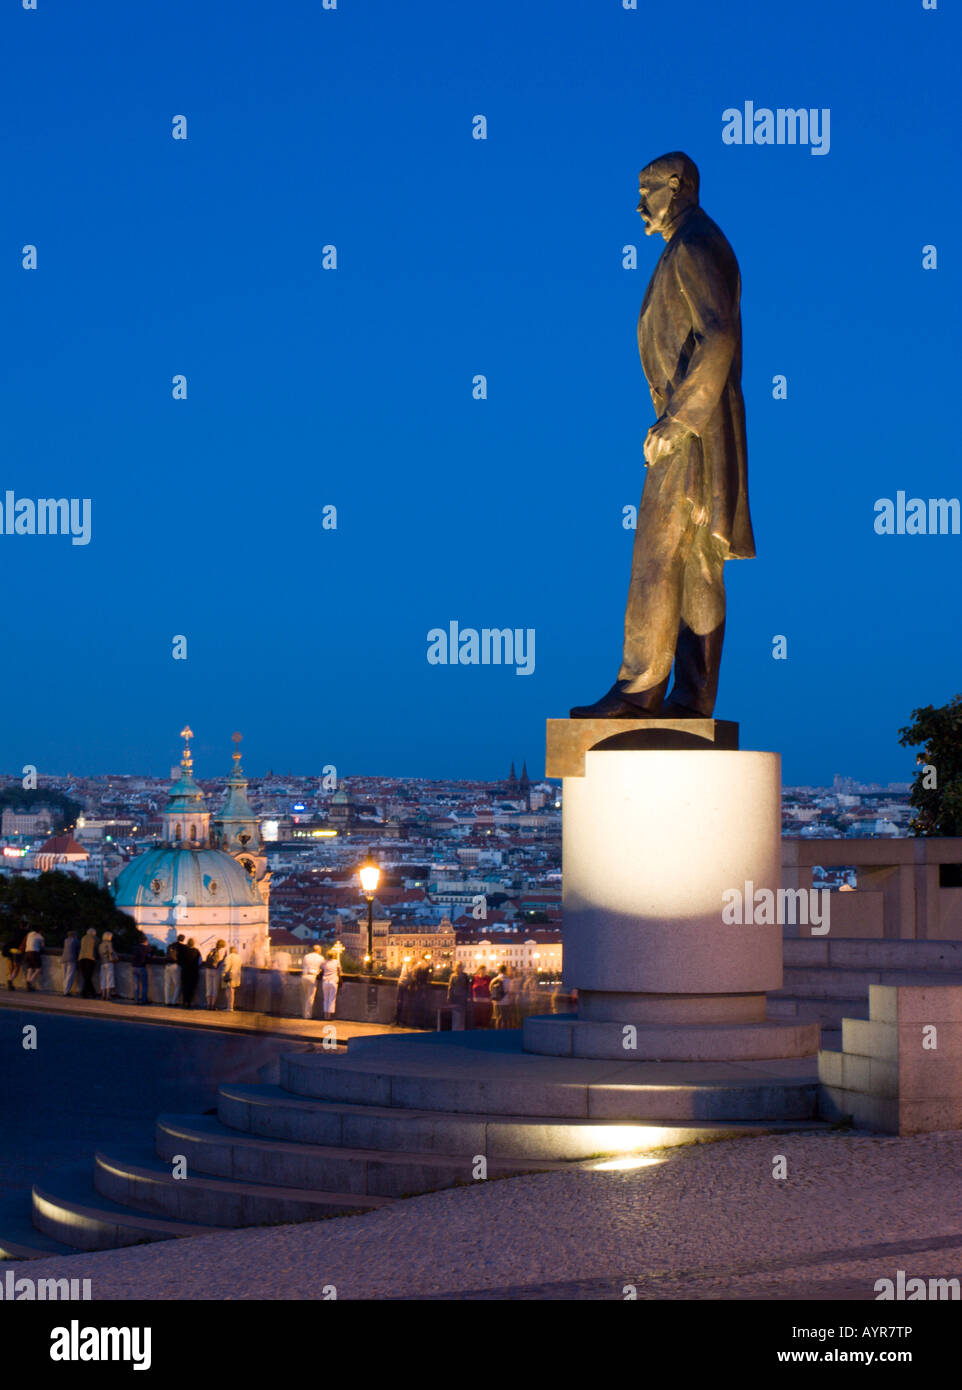 Statue of Tomáoe Garrigue Masaryk (Thomas Masaryk), Prague, Czech Republic Stock Photo